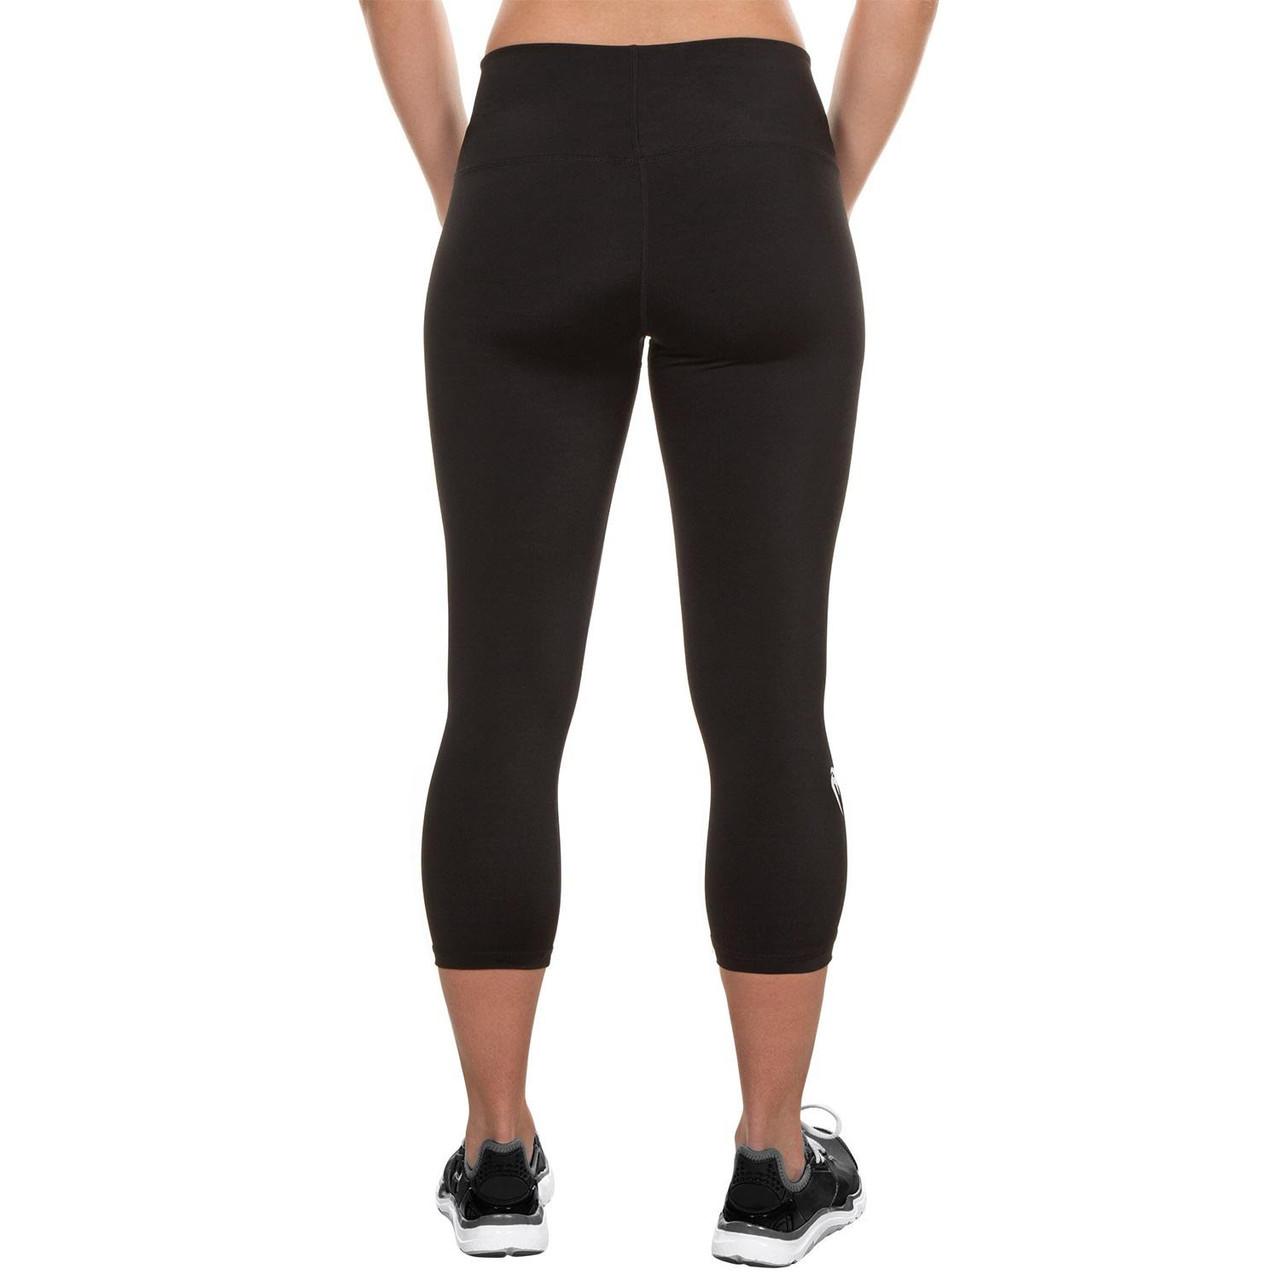 Back of the Venum Essential Leggings now available at www.thejiujitsushop.com  Enjoy Free Shipping from The Jiu Jitsu Shop today!